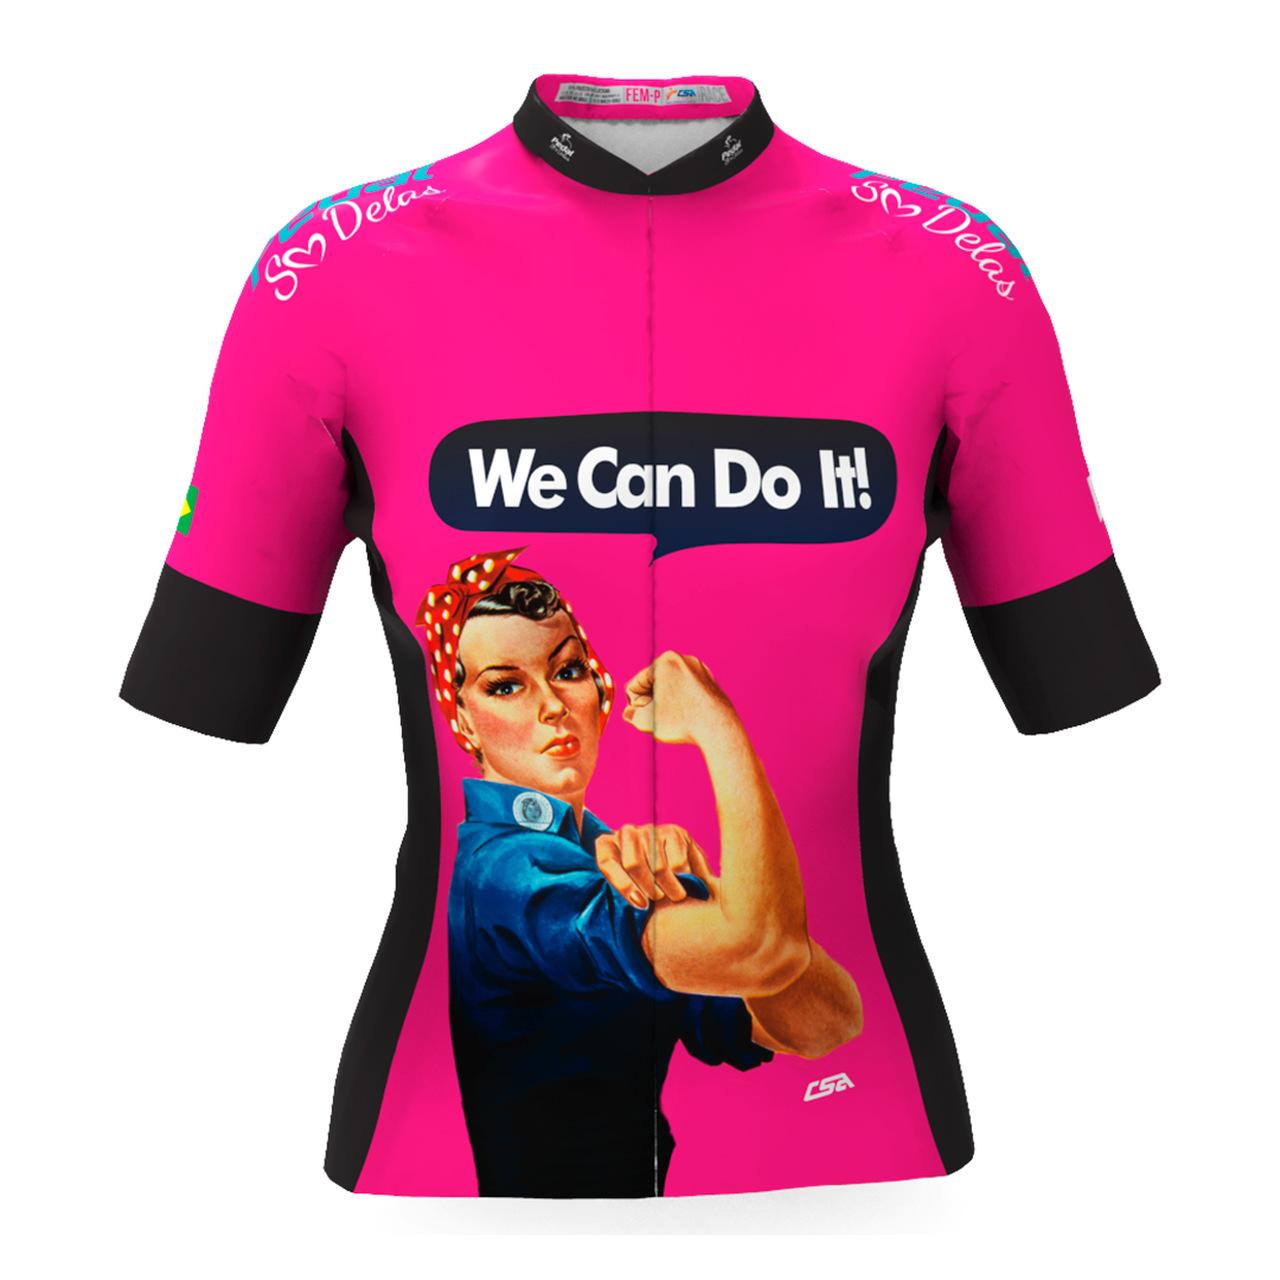 Camisa Ciclista Tour Pedal Só Delas Feminina We Can Do It!